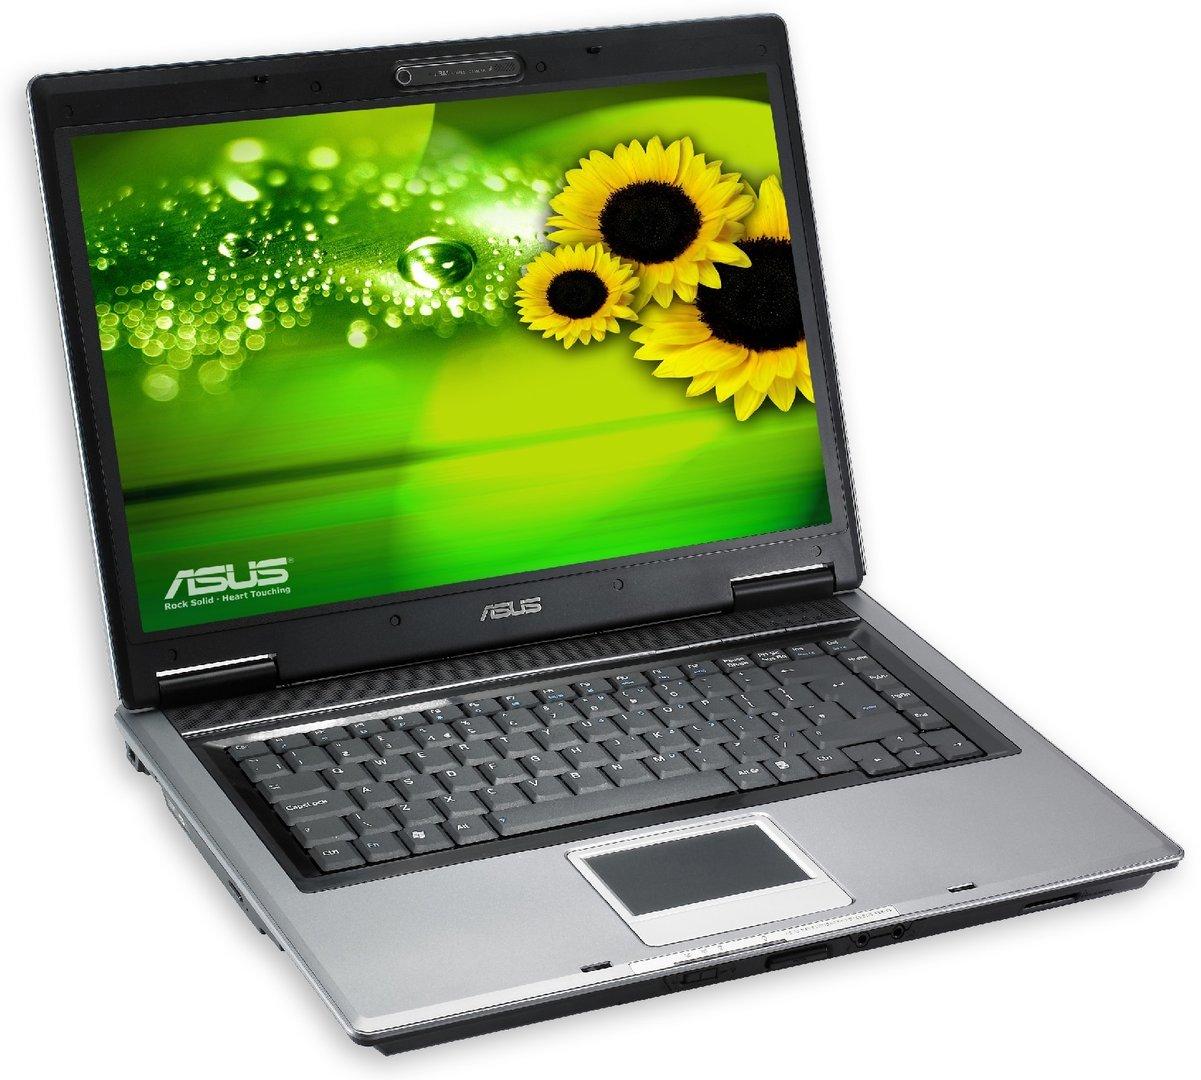 Asus F3-Serie